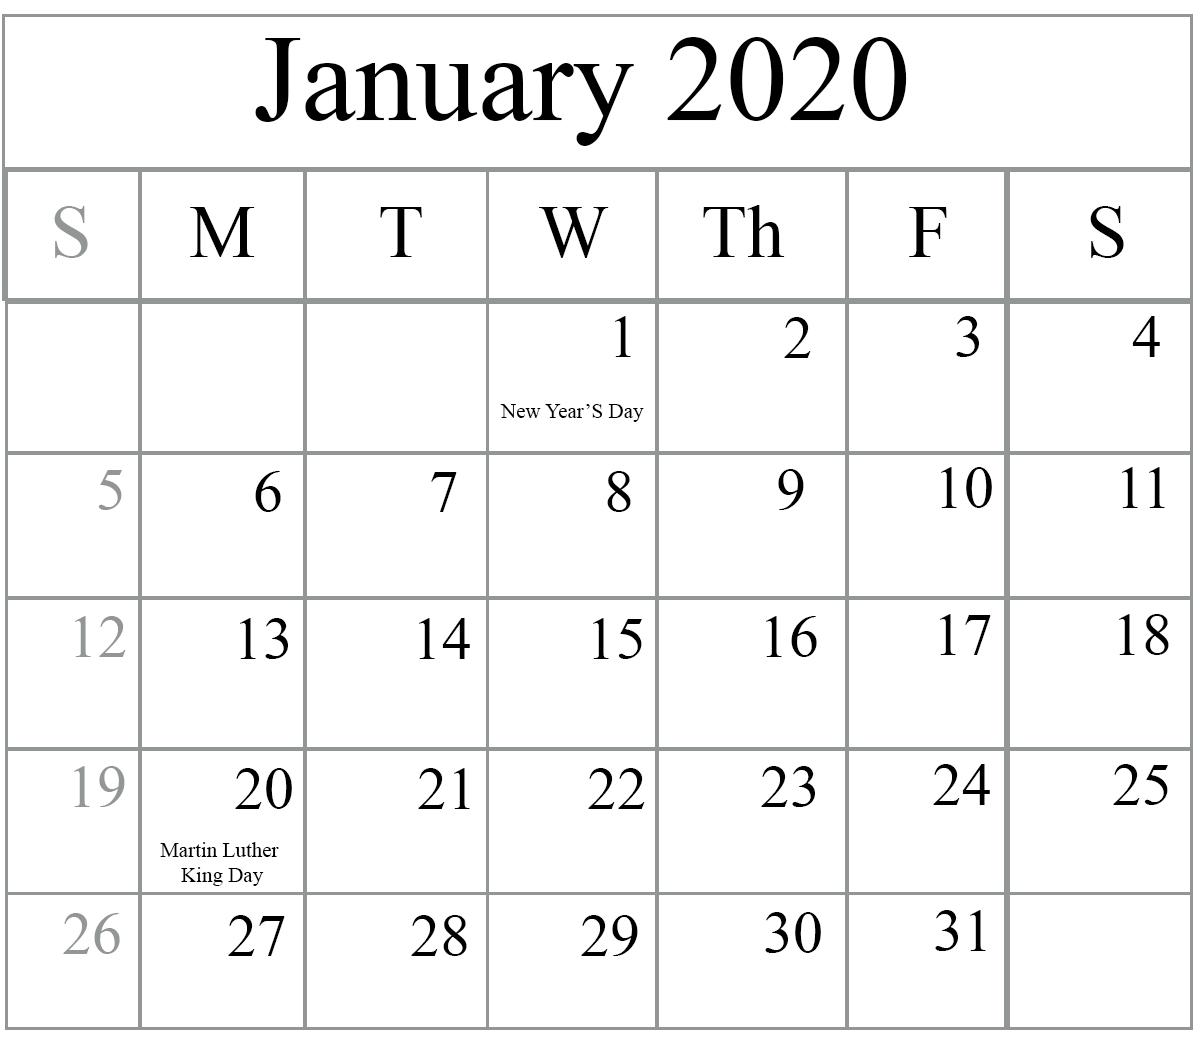 January 2020 Calendar Holidays US